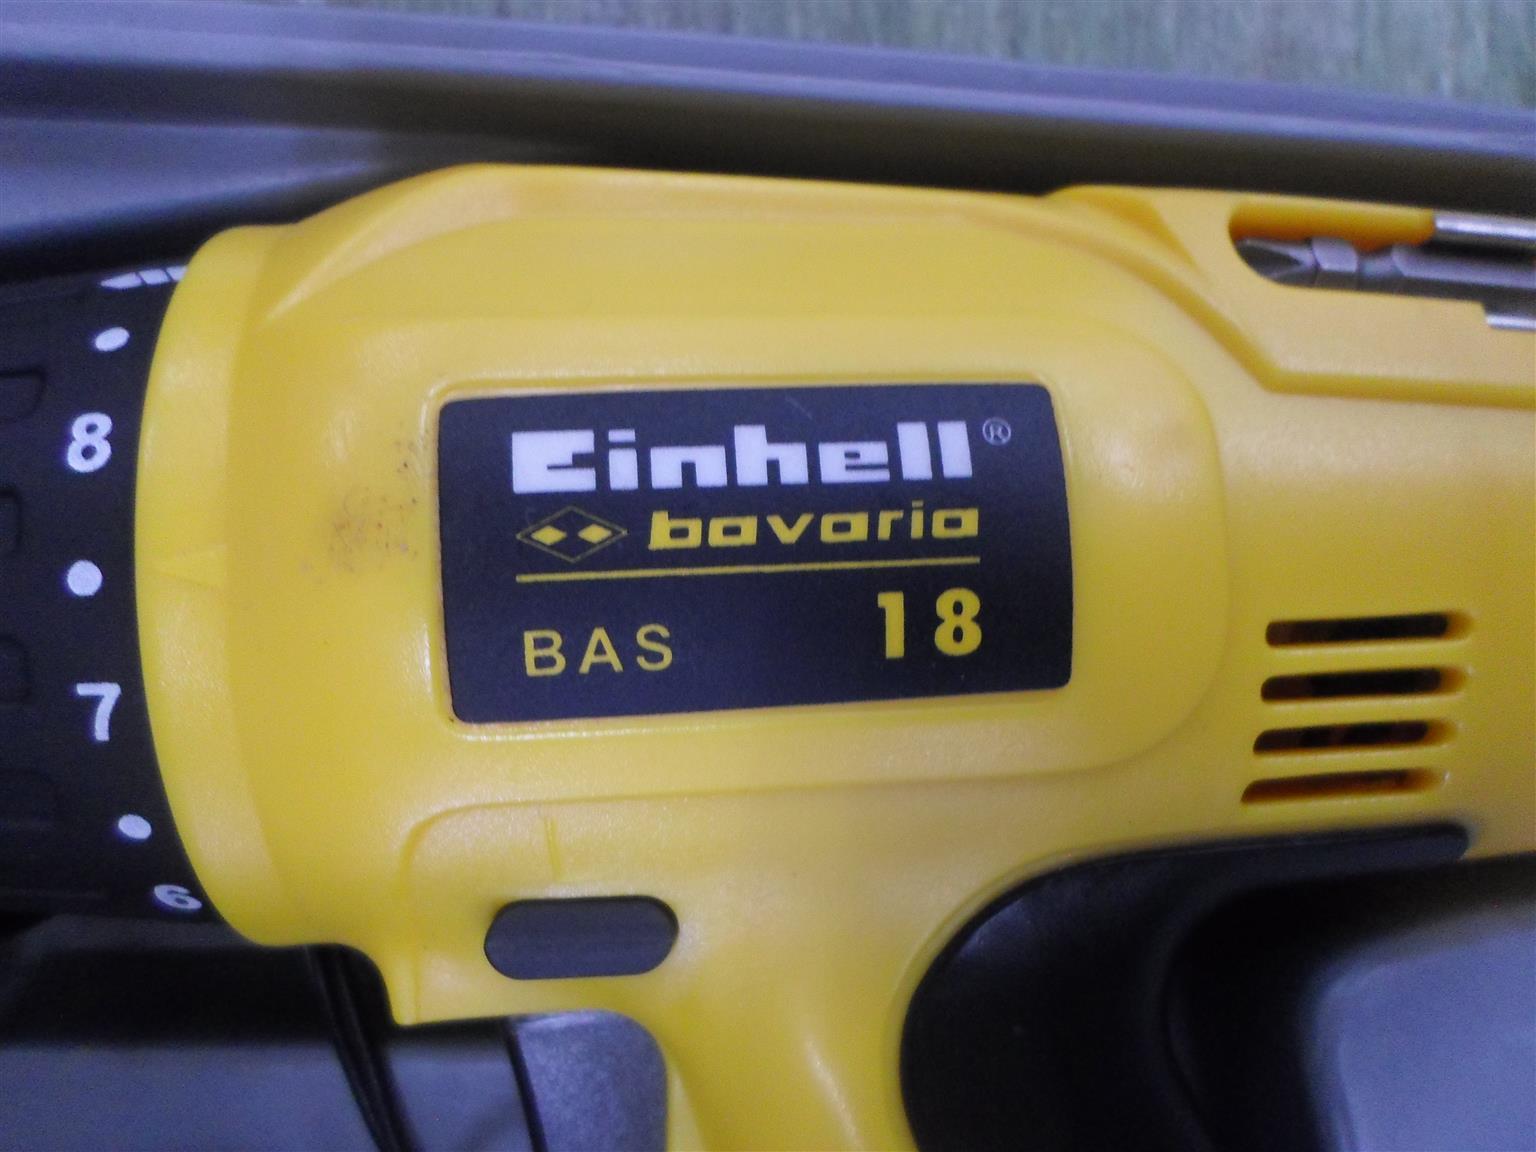 Einhell Bavaria 18V Cordless Drill